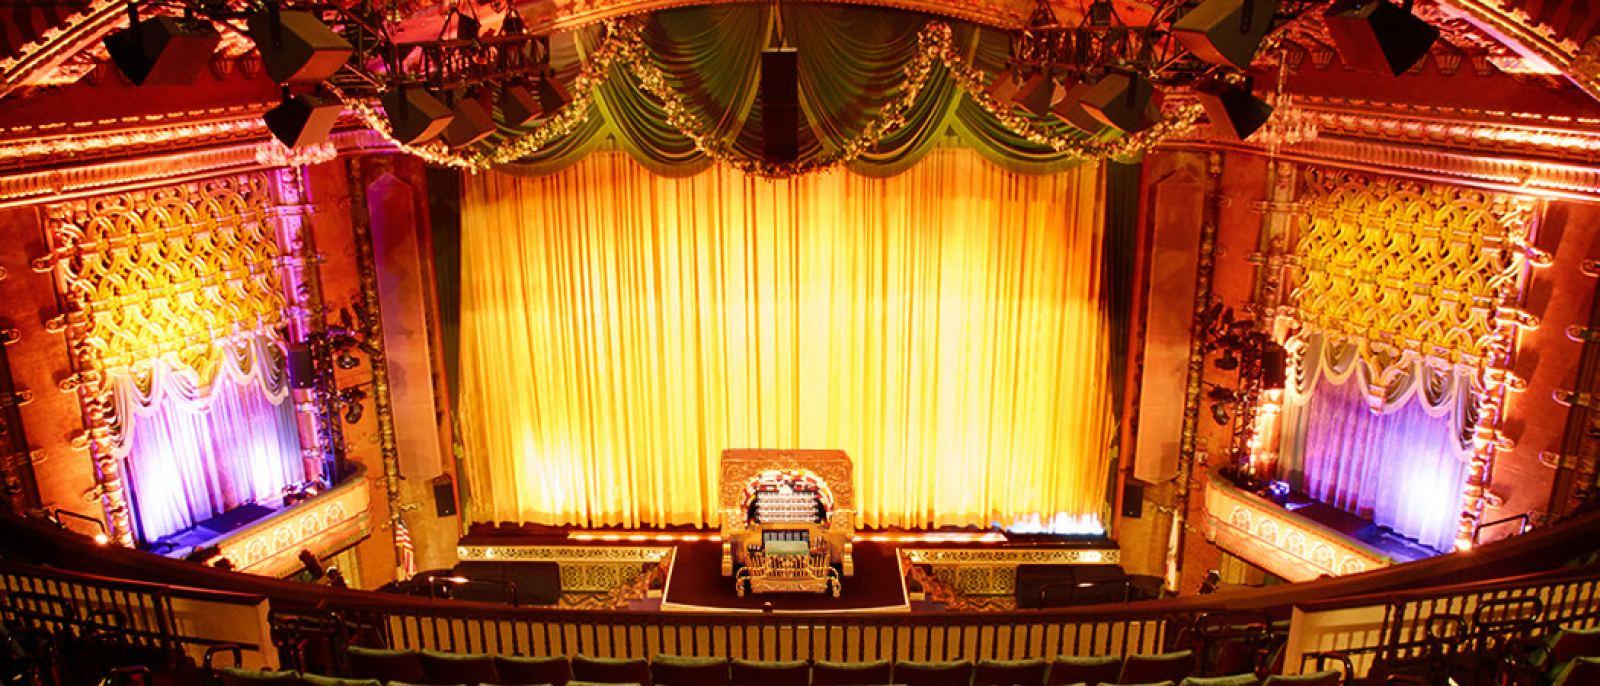 Wurlitzer pipe organ | Photo courtesy of El Capitan Theatre